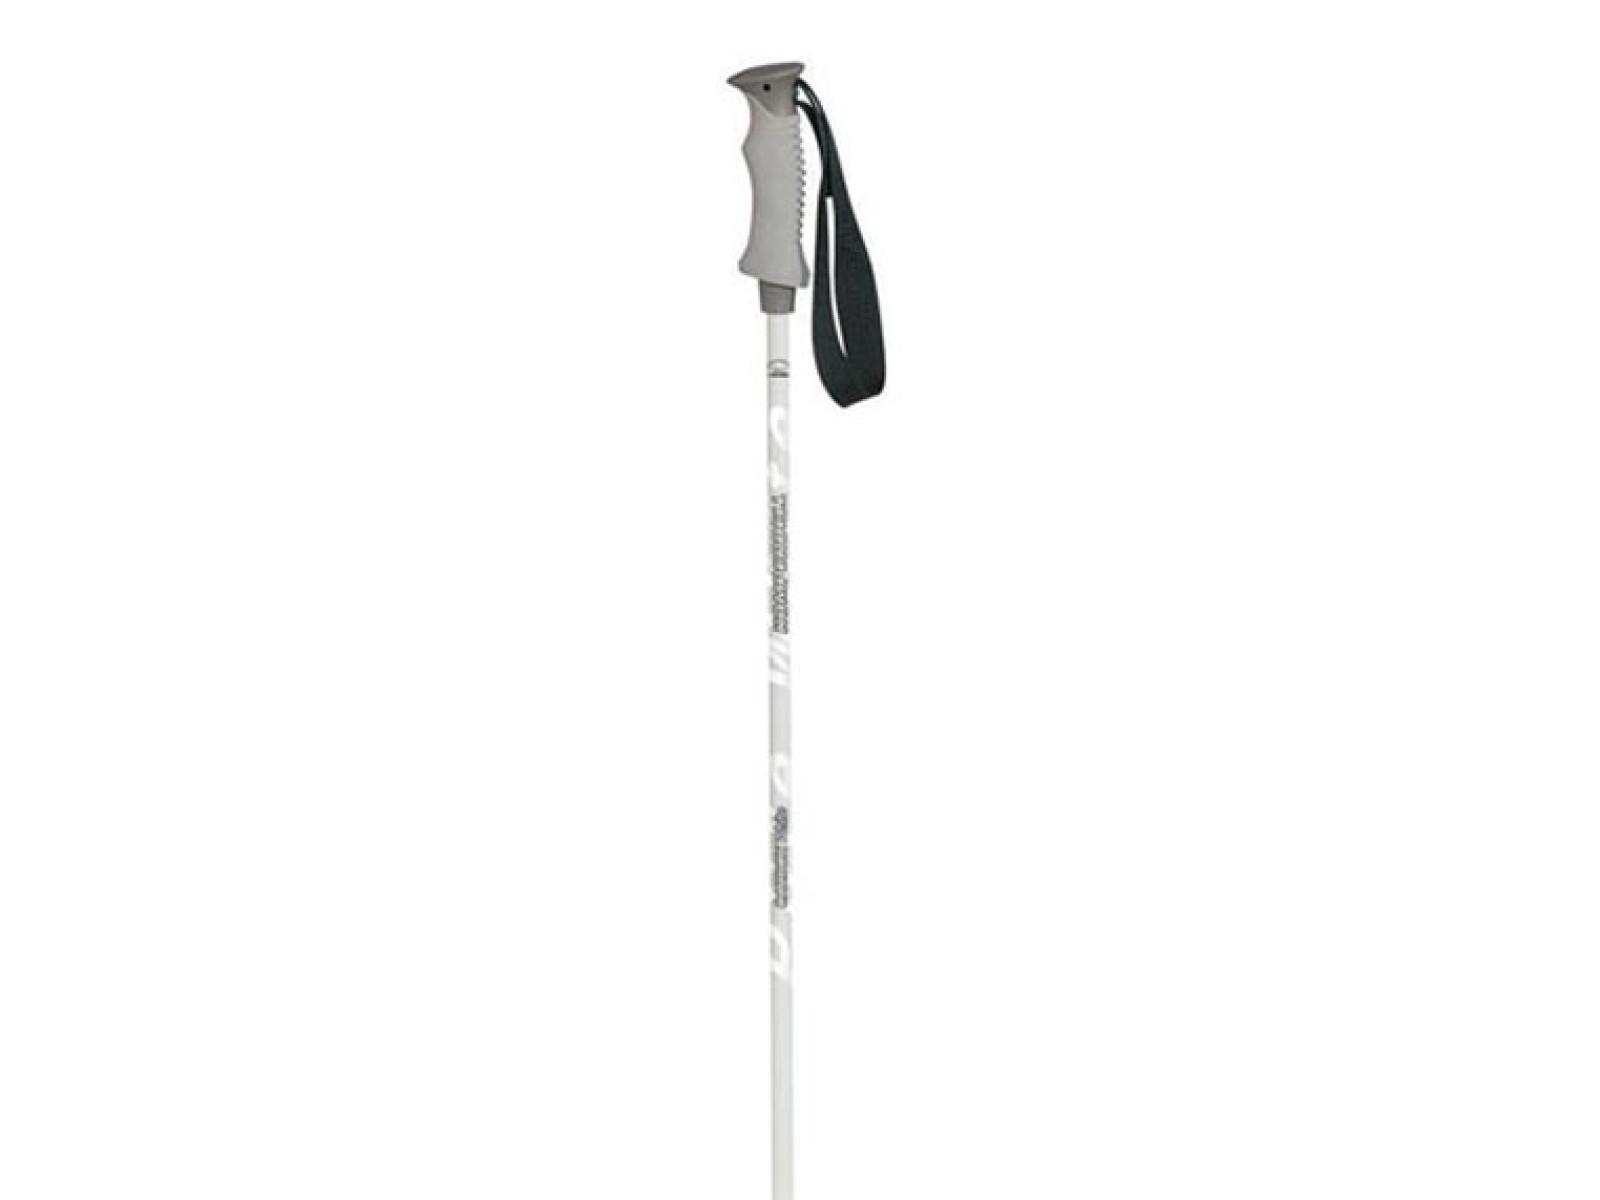 Komperdell Carbon Pure White Délka holí: 120 cm 2013/2014